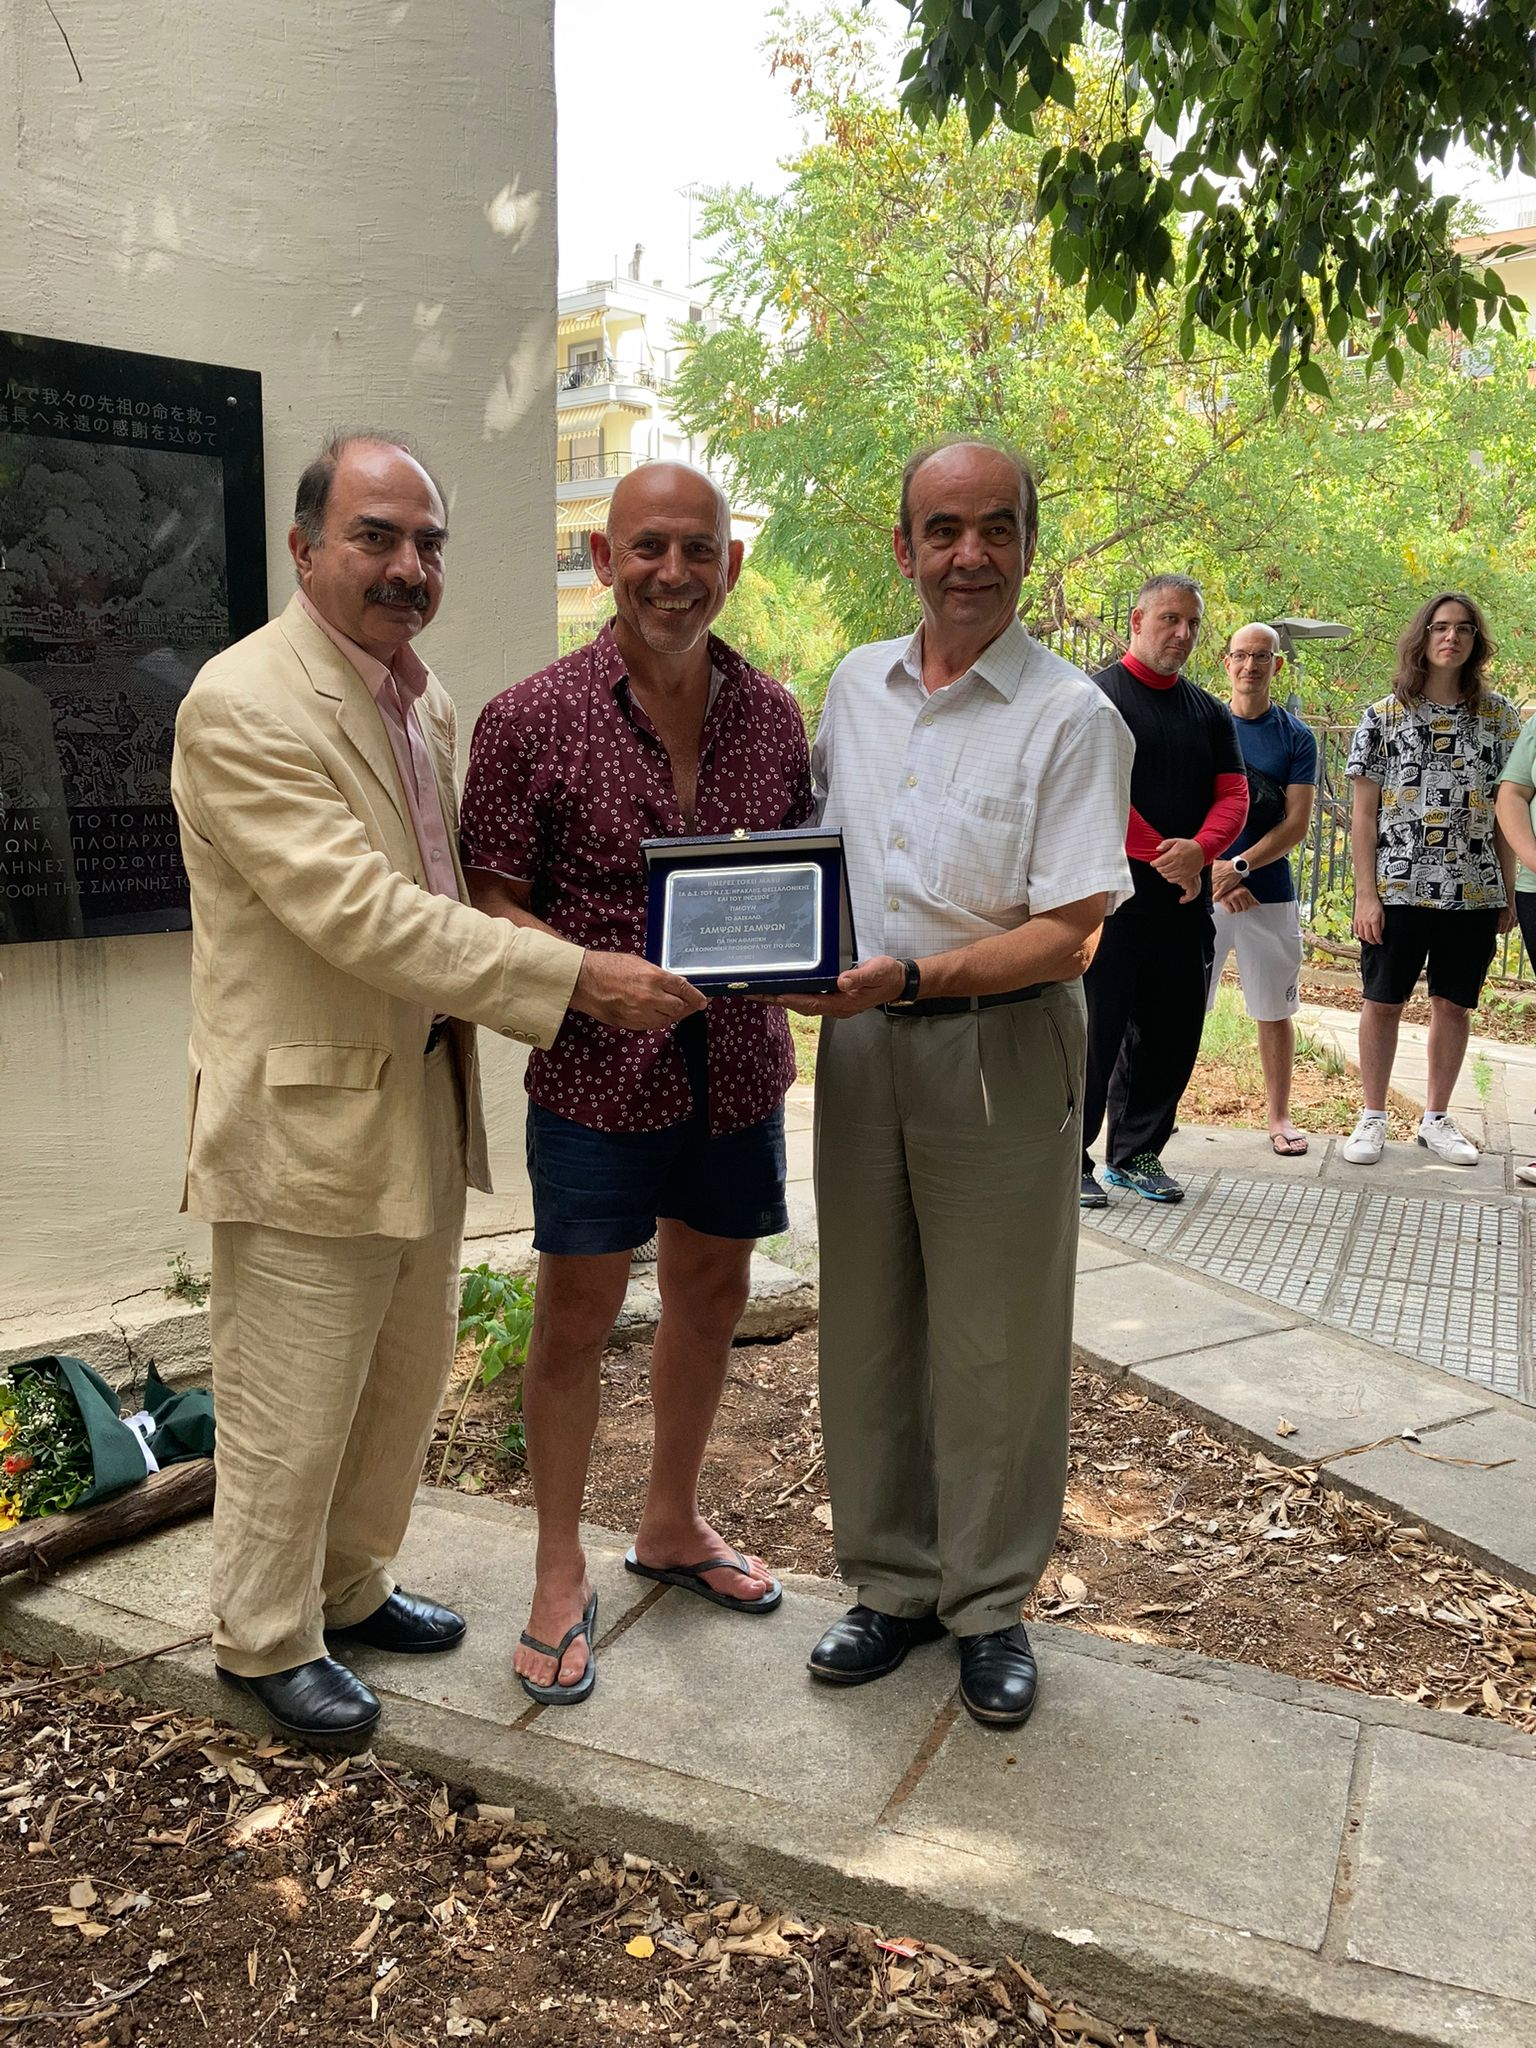 Sampson Sampson presented with award in Greece